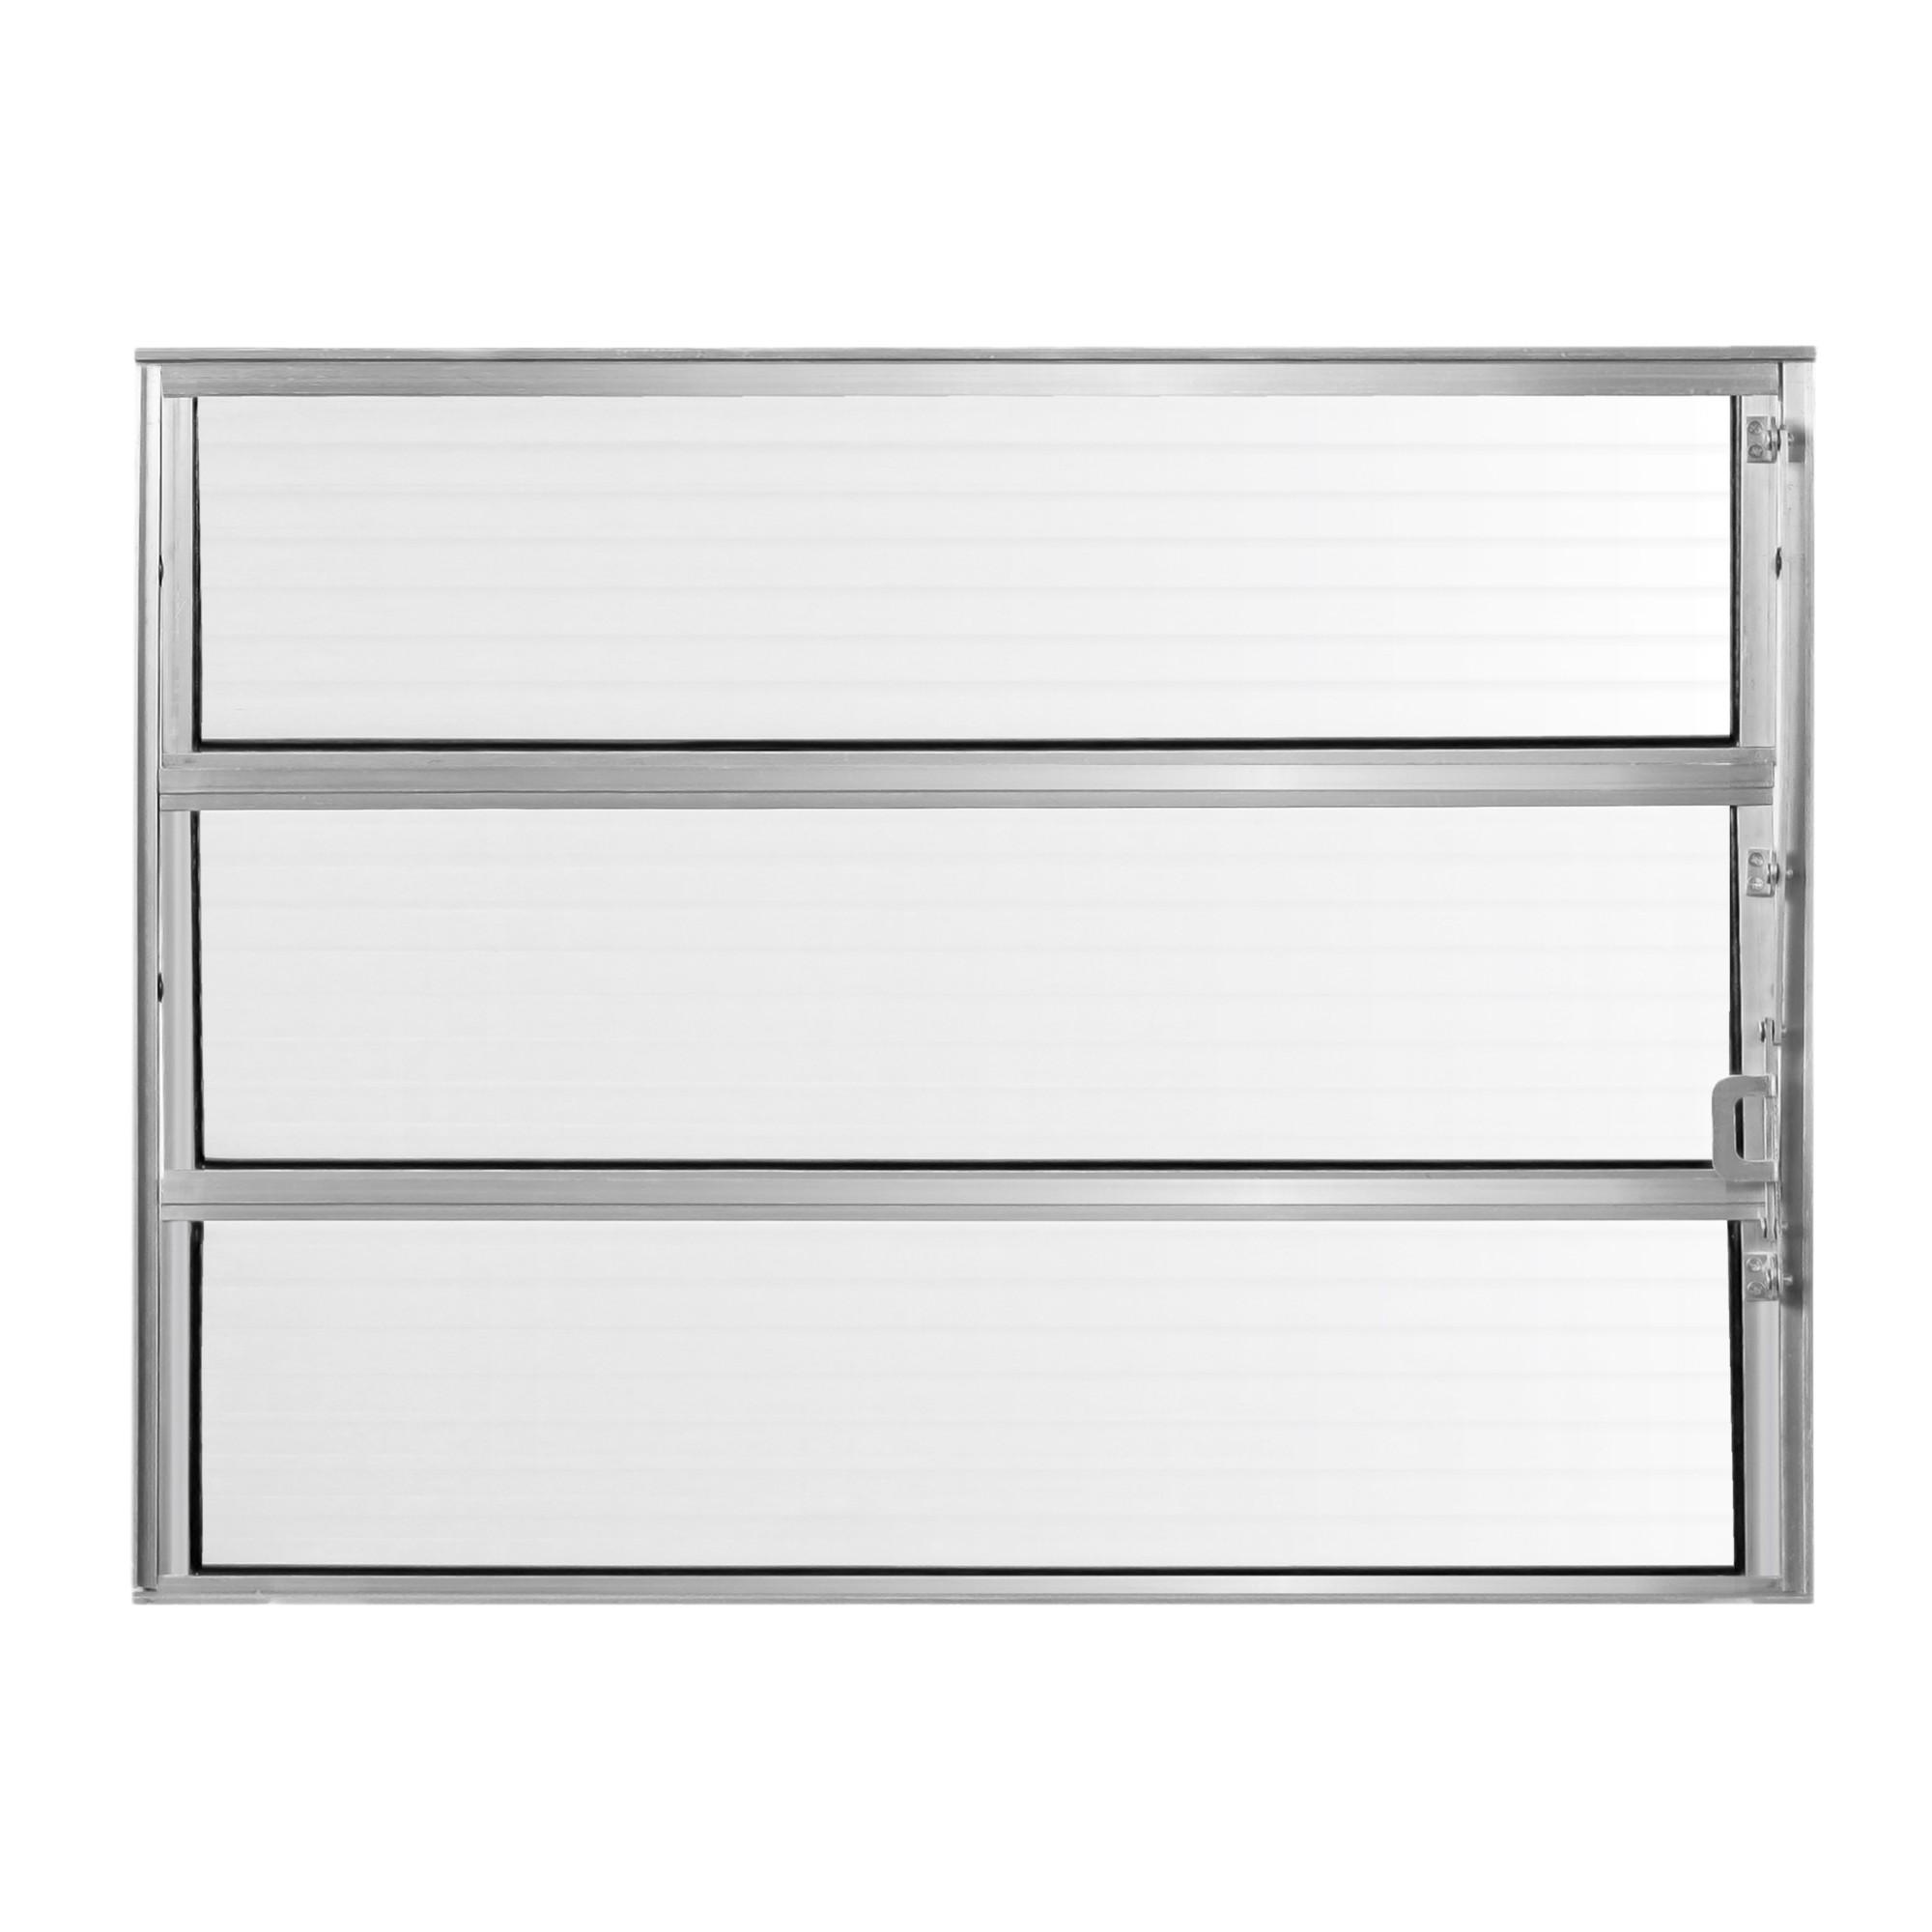 Janela de Abrir Basculante de Aluminio Vidro Canelado 60x80 cm Cinza - Aluvid